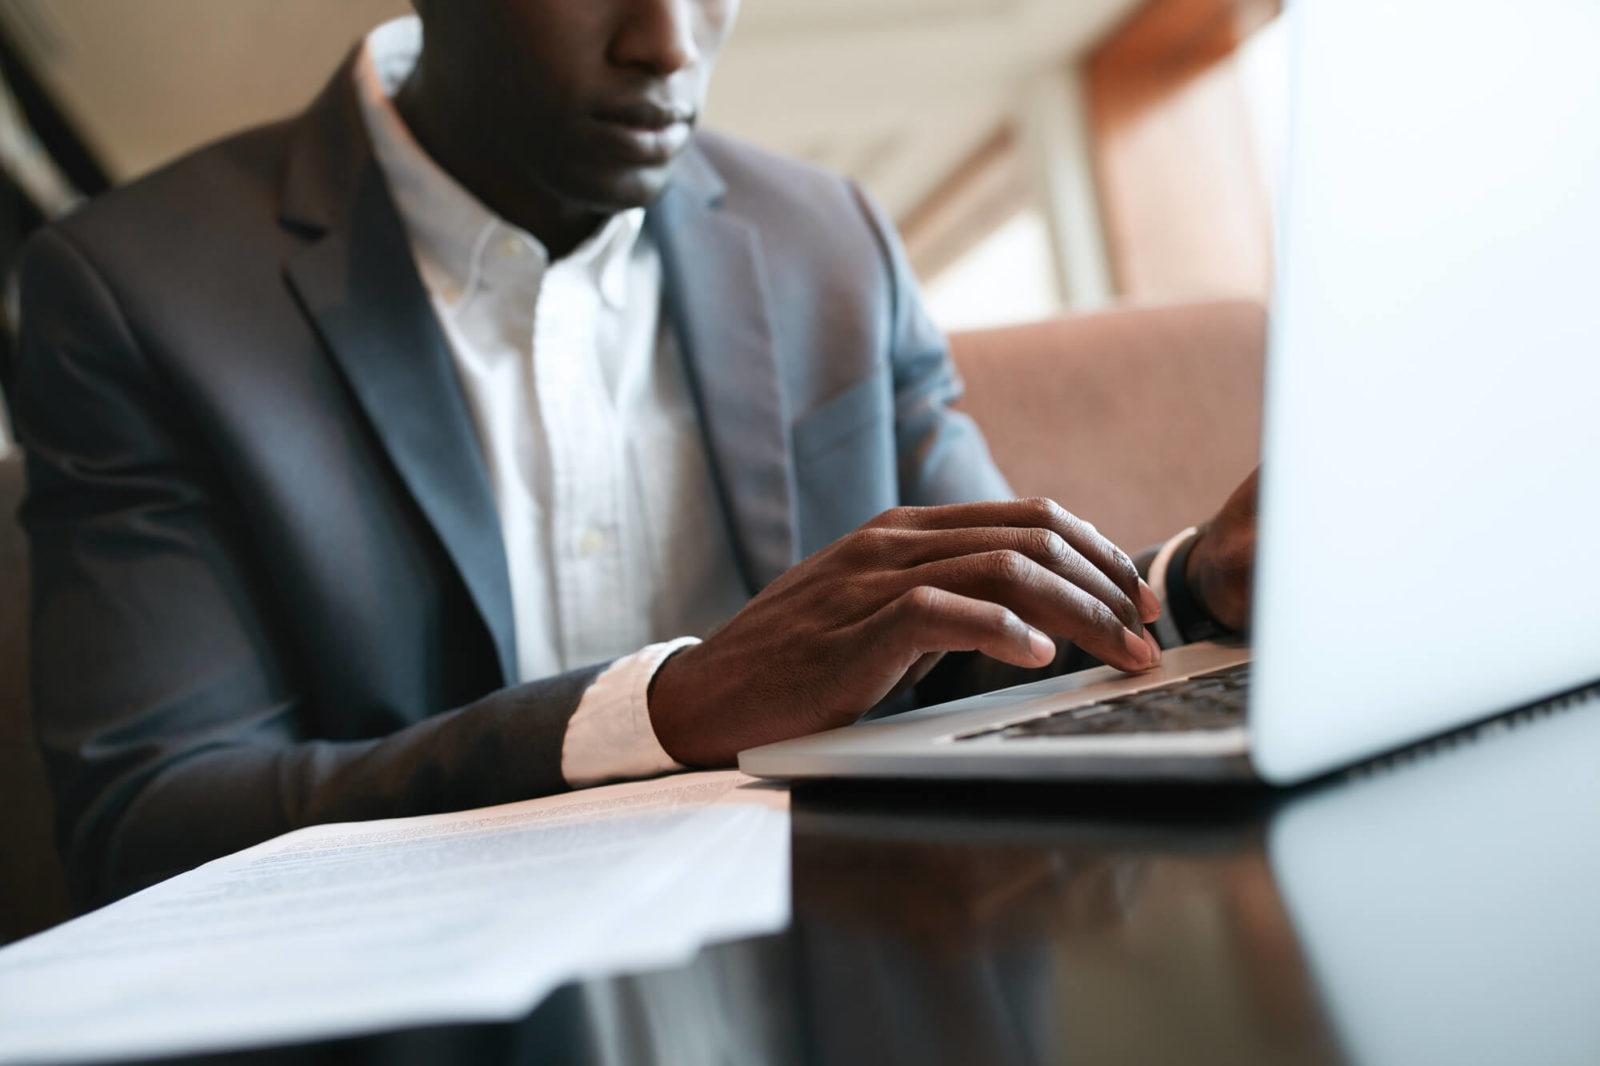 perfil-de-investidor-ideal-para-peer-to-peer-lending